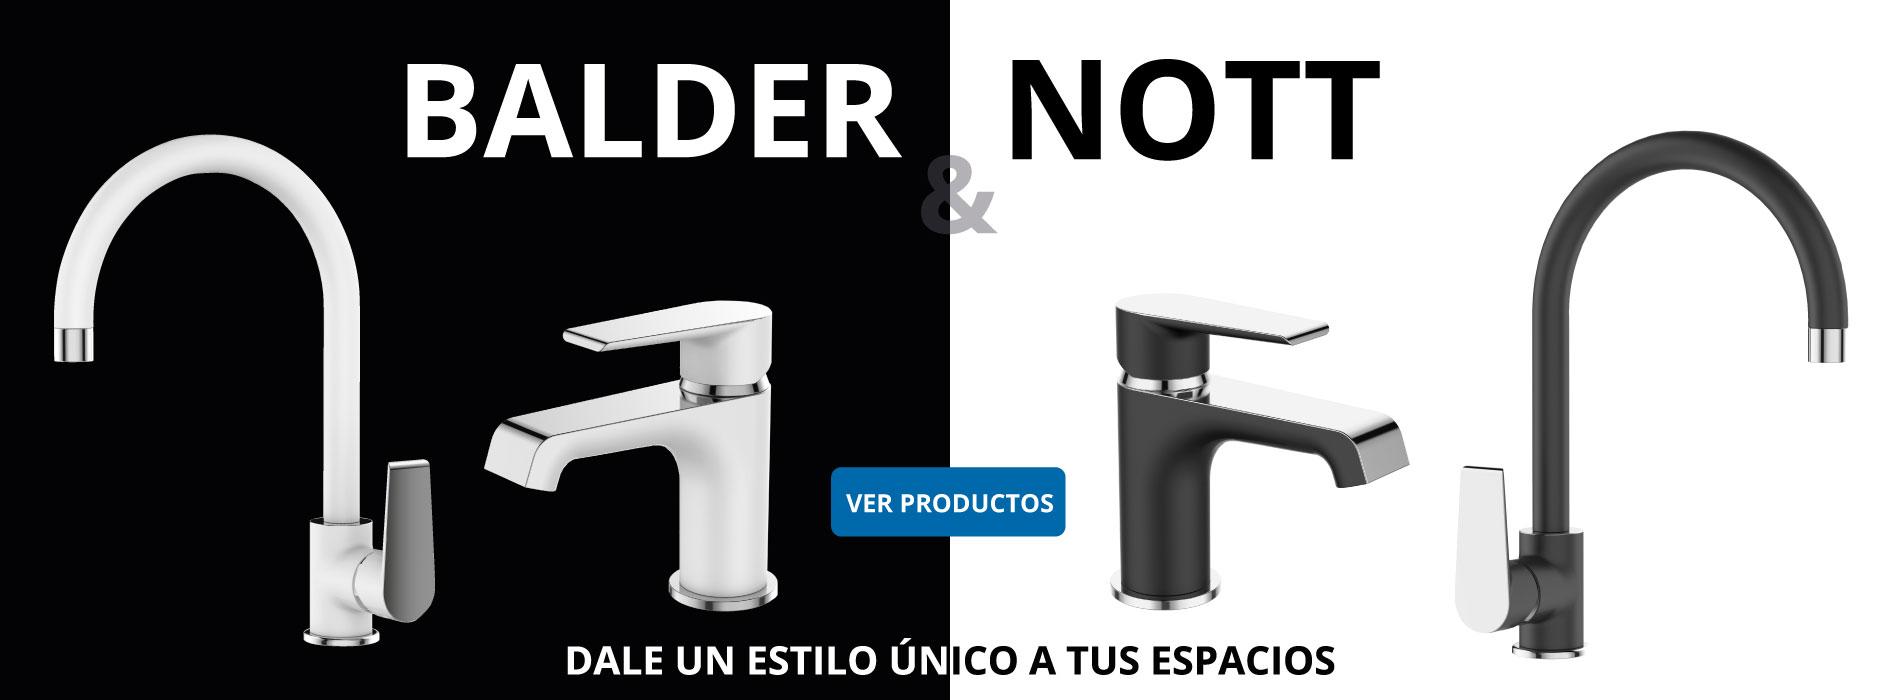 Balder_nott [activo]